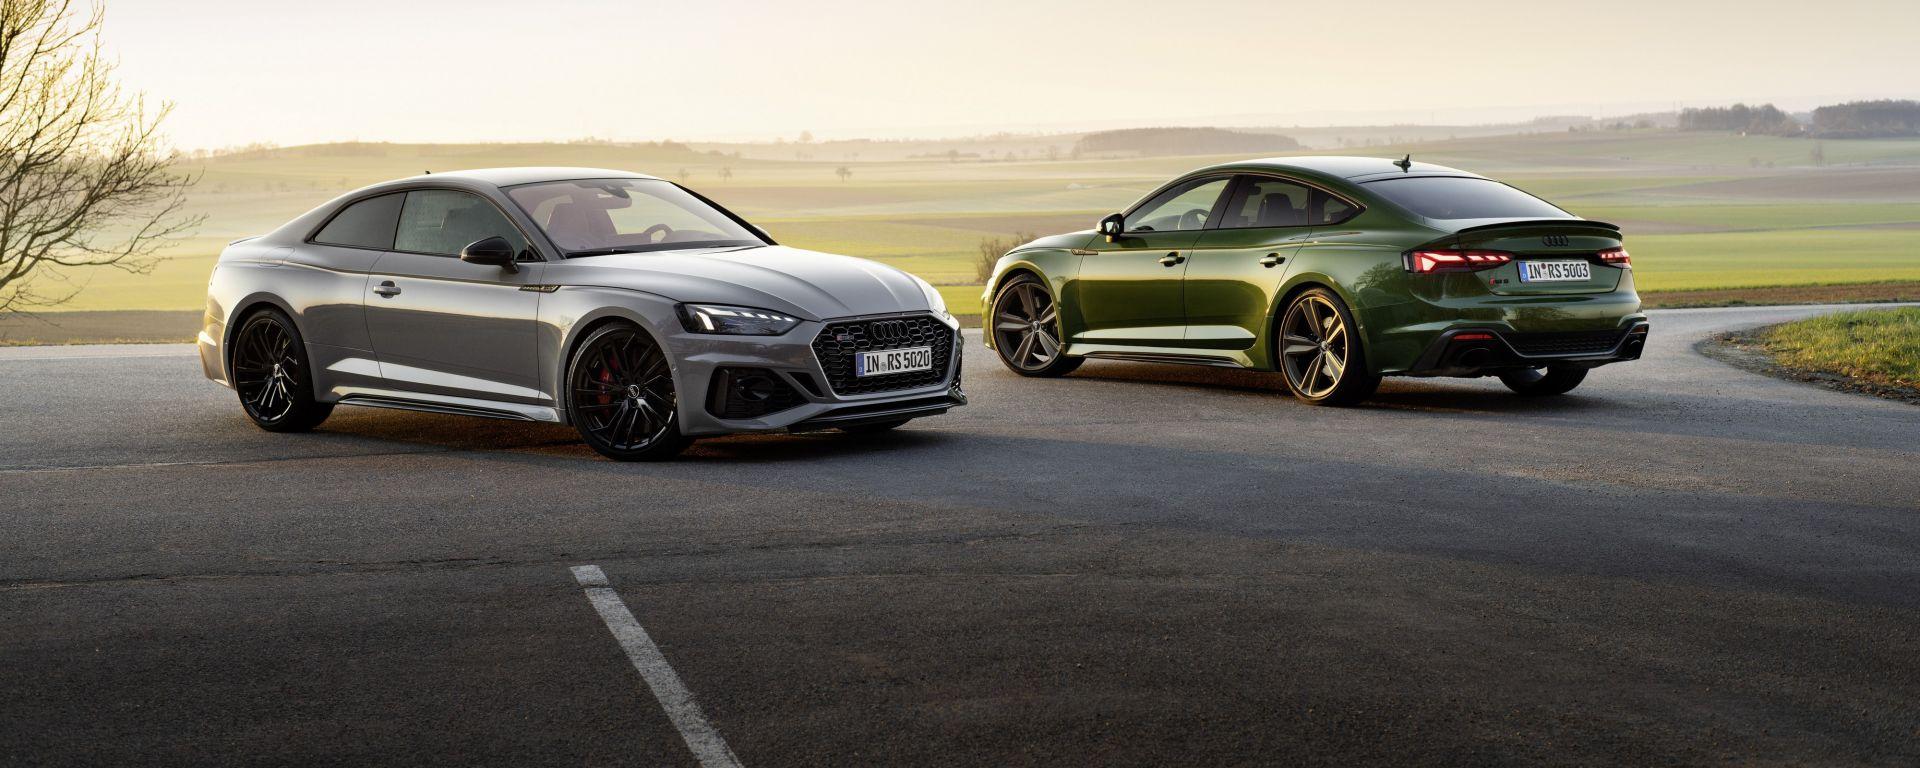 Audi RS5 Coupé ed RS5 Sportback 2020, prezzi da 83.500 euro